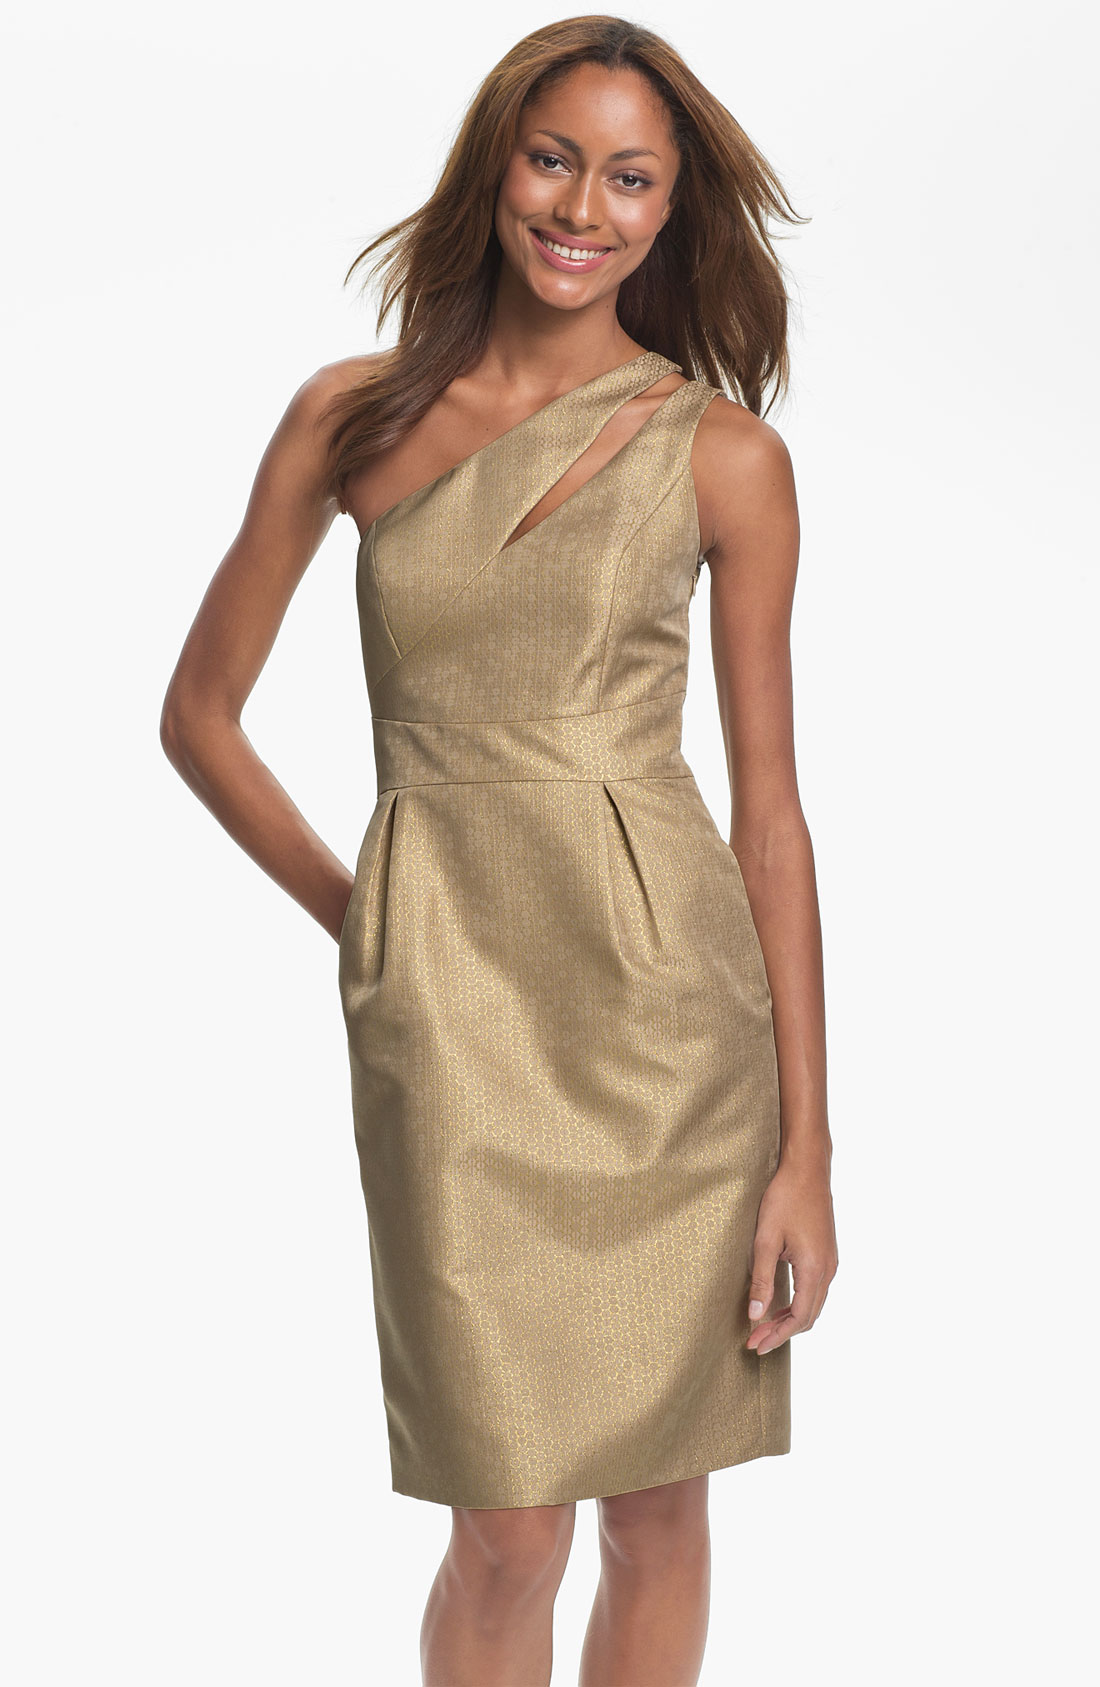 Nordstrom: Ml Monique Lhuillier Bridesmaids One Shoulder Metallic